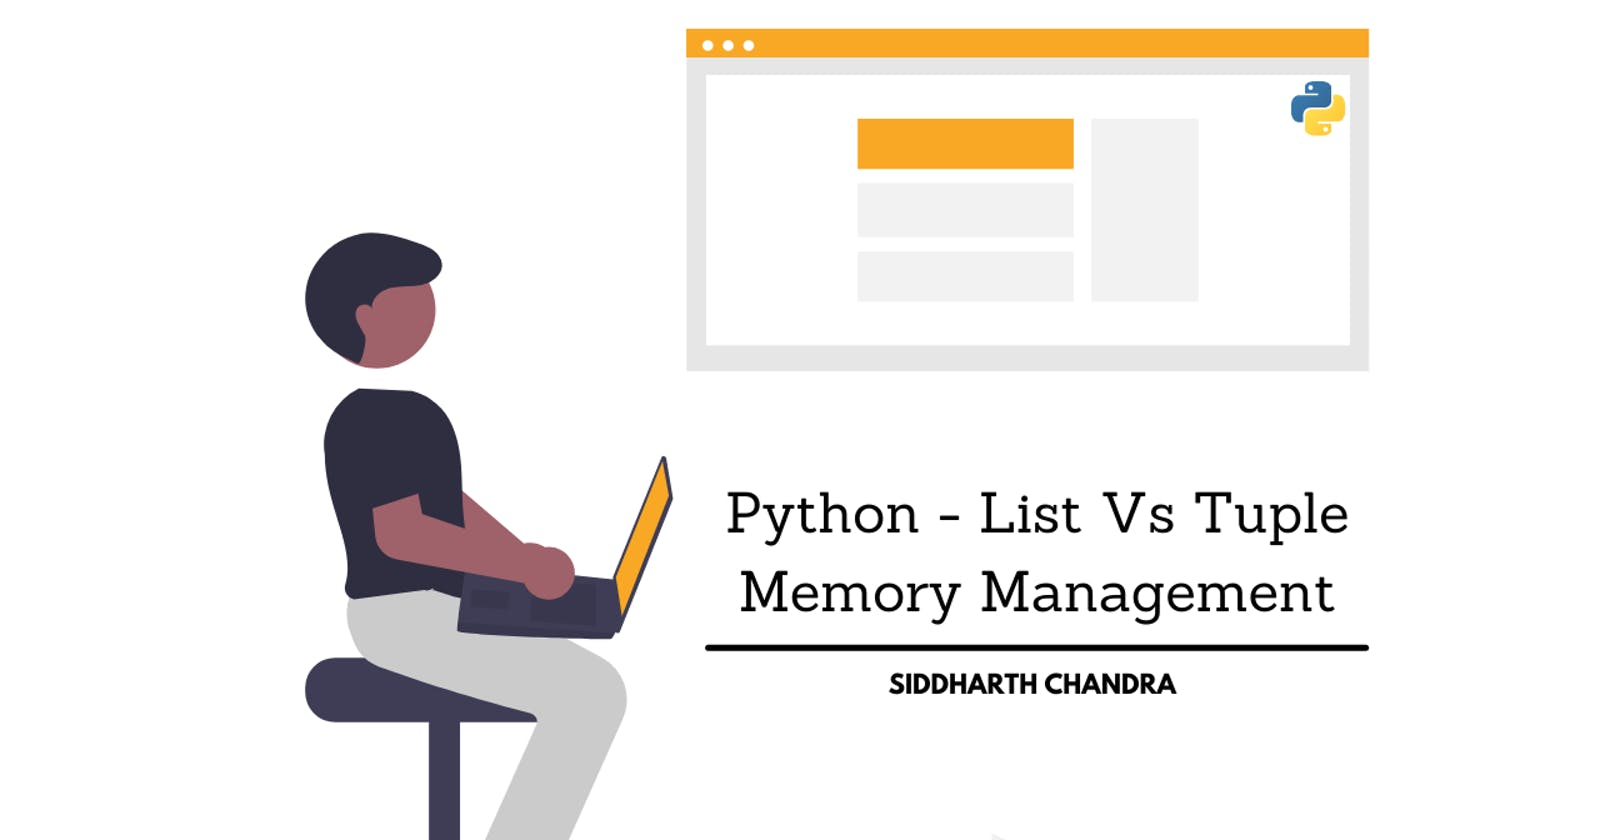 Python - List Vs Tuple Memory Management